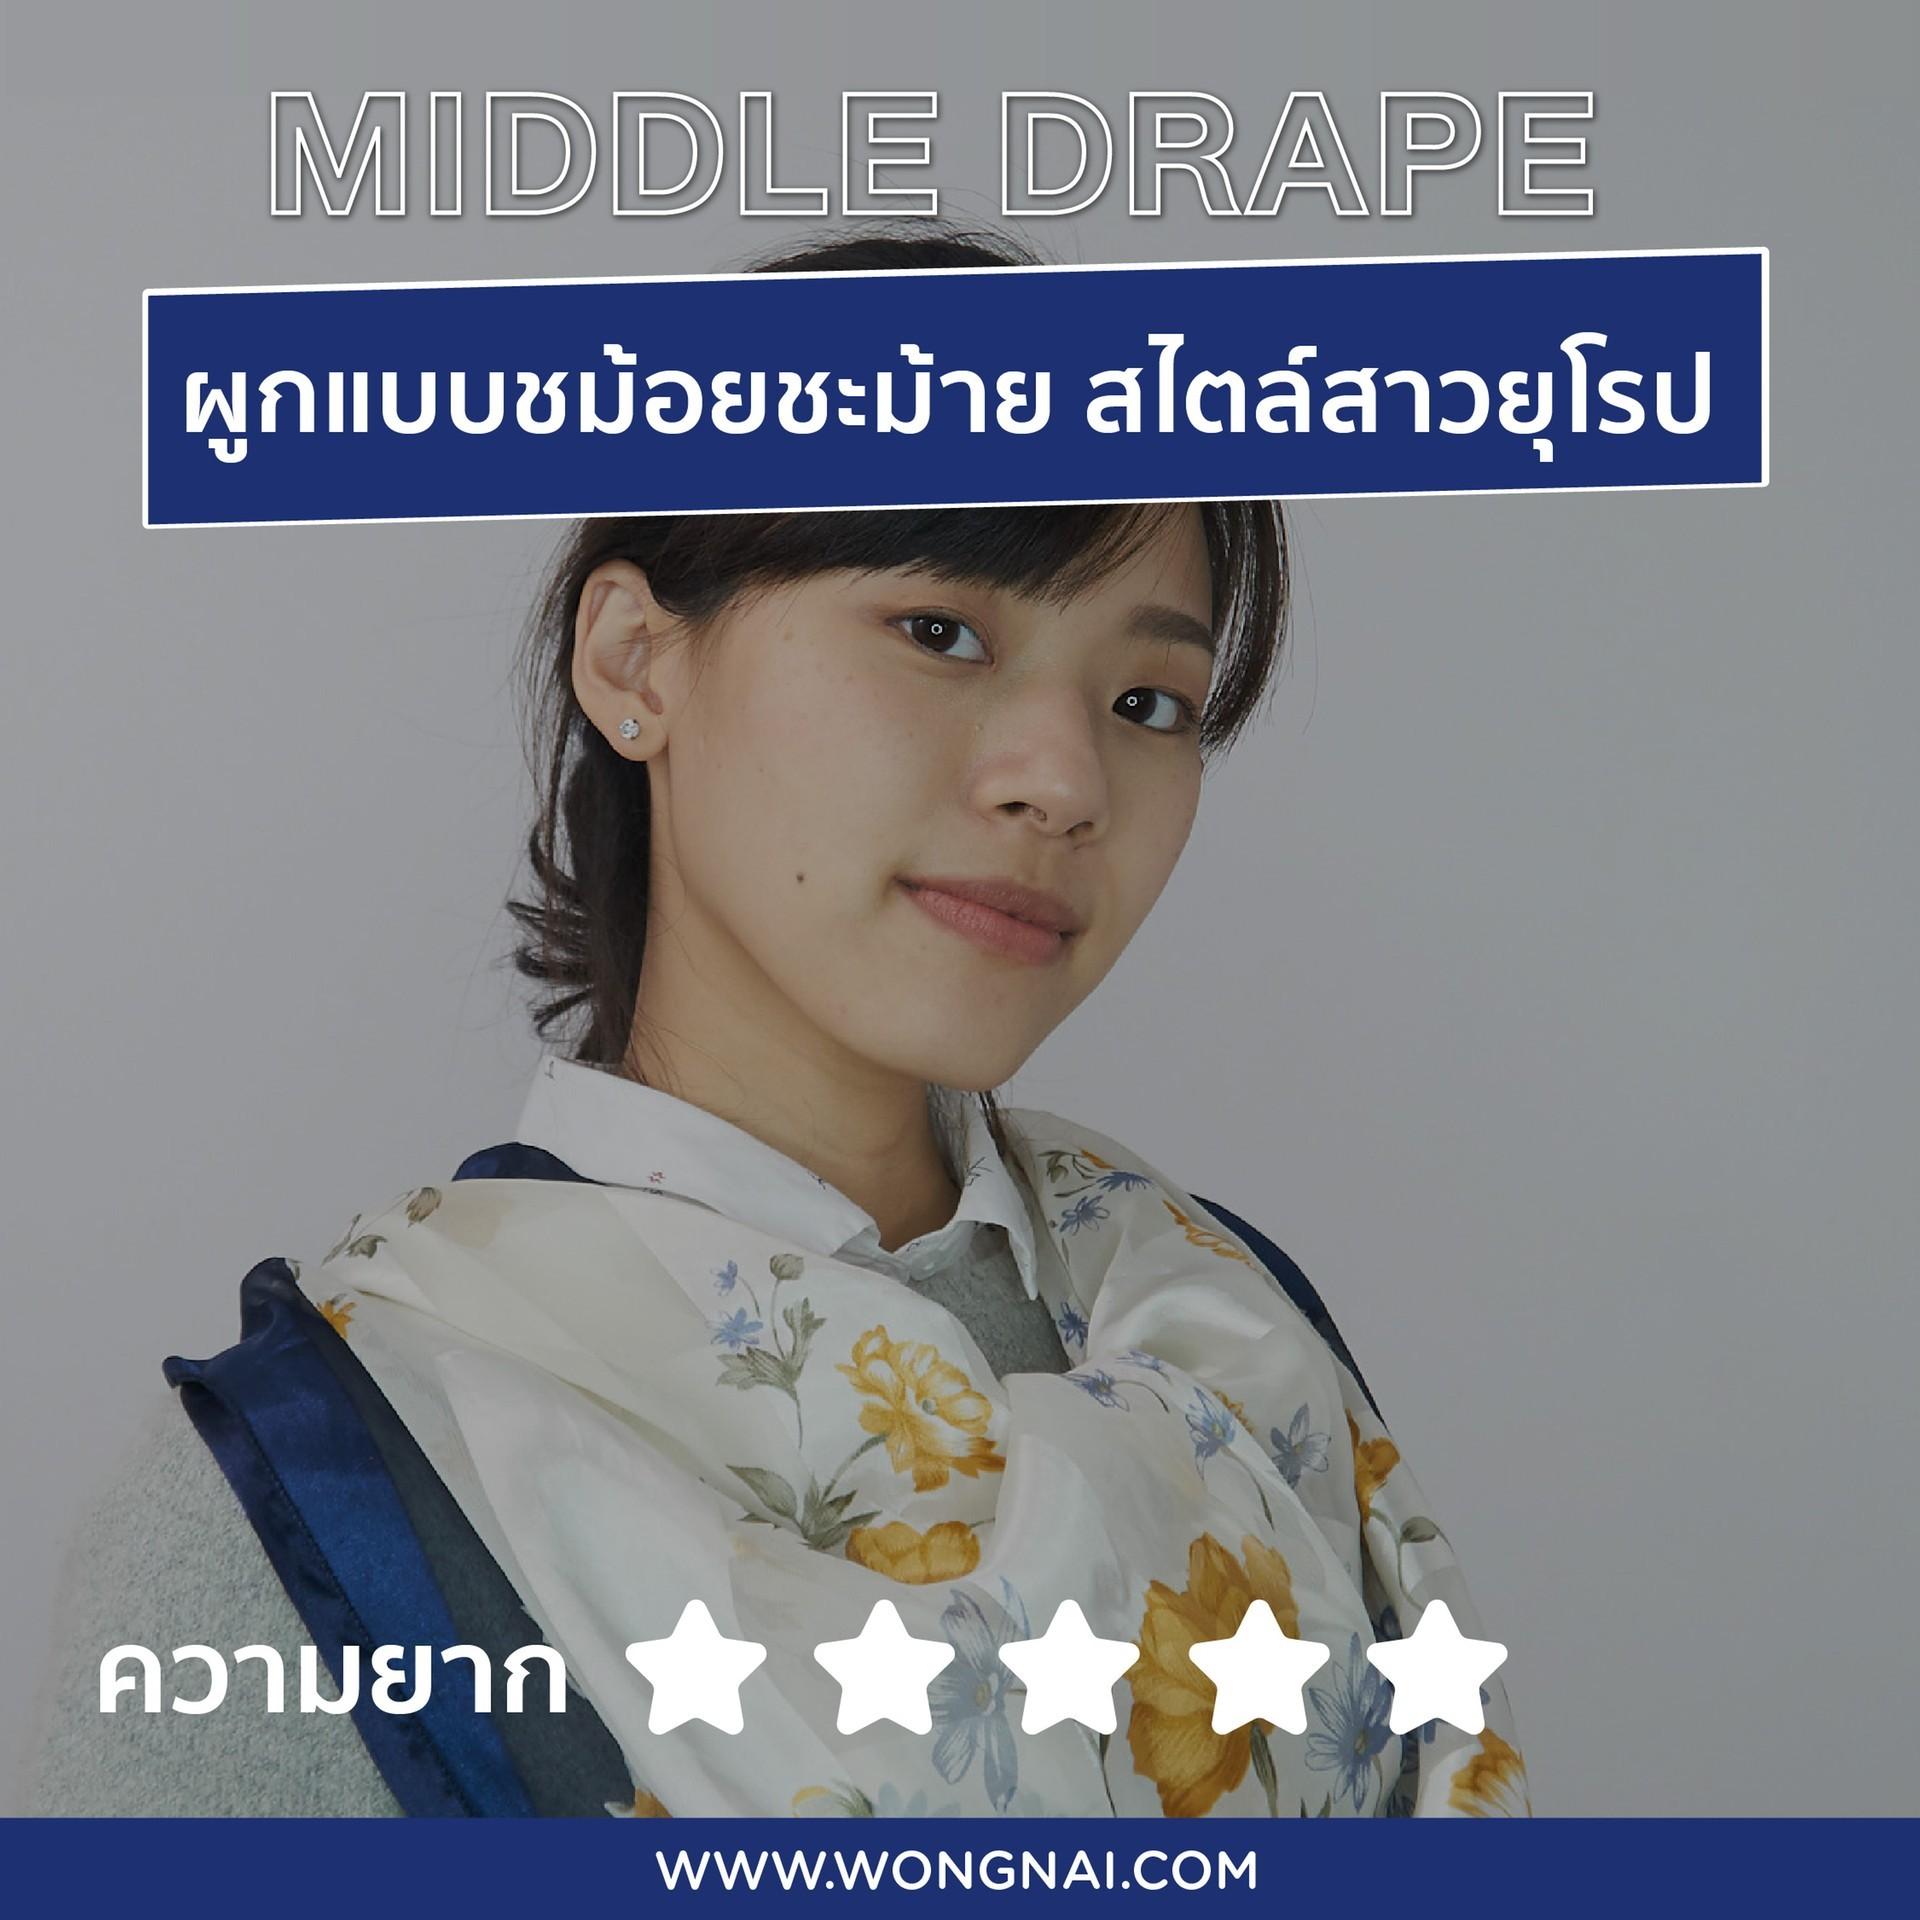 Middle Drape